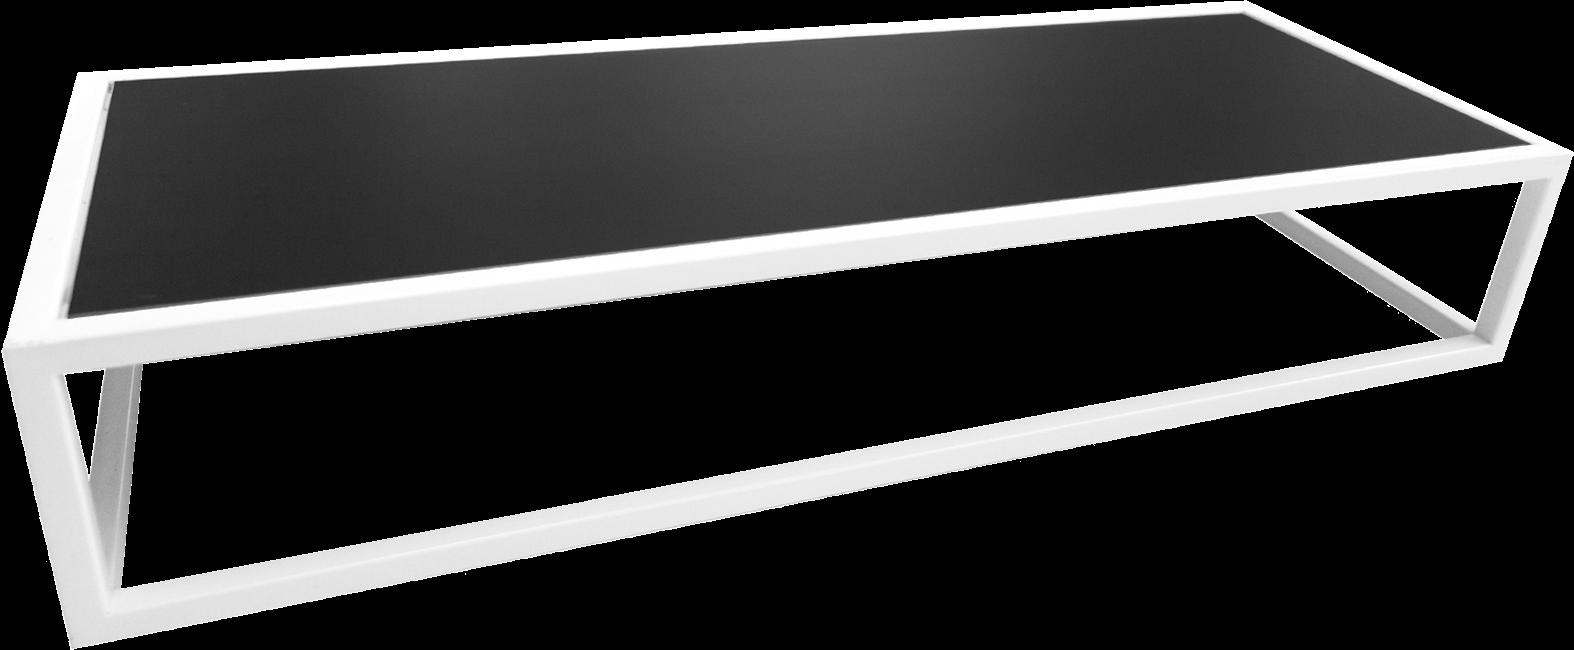 White Linear Table Riser Frame - 80 x 30 x 15cm H